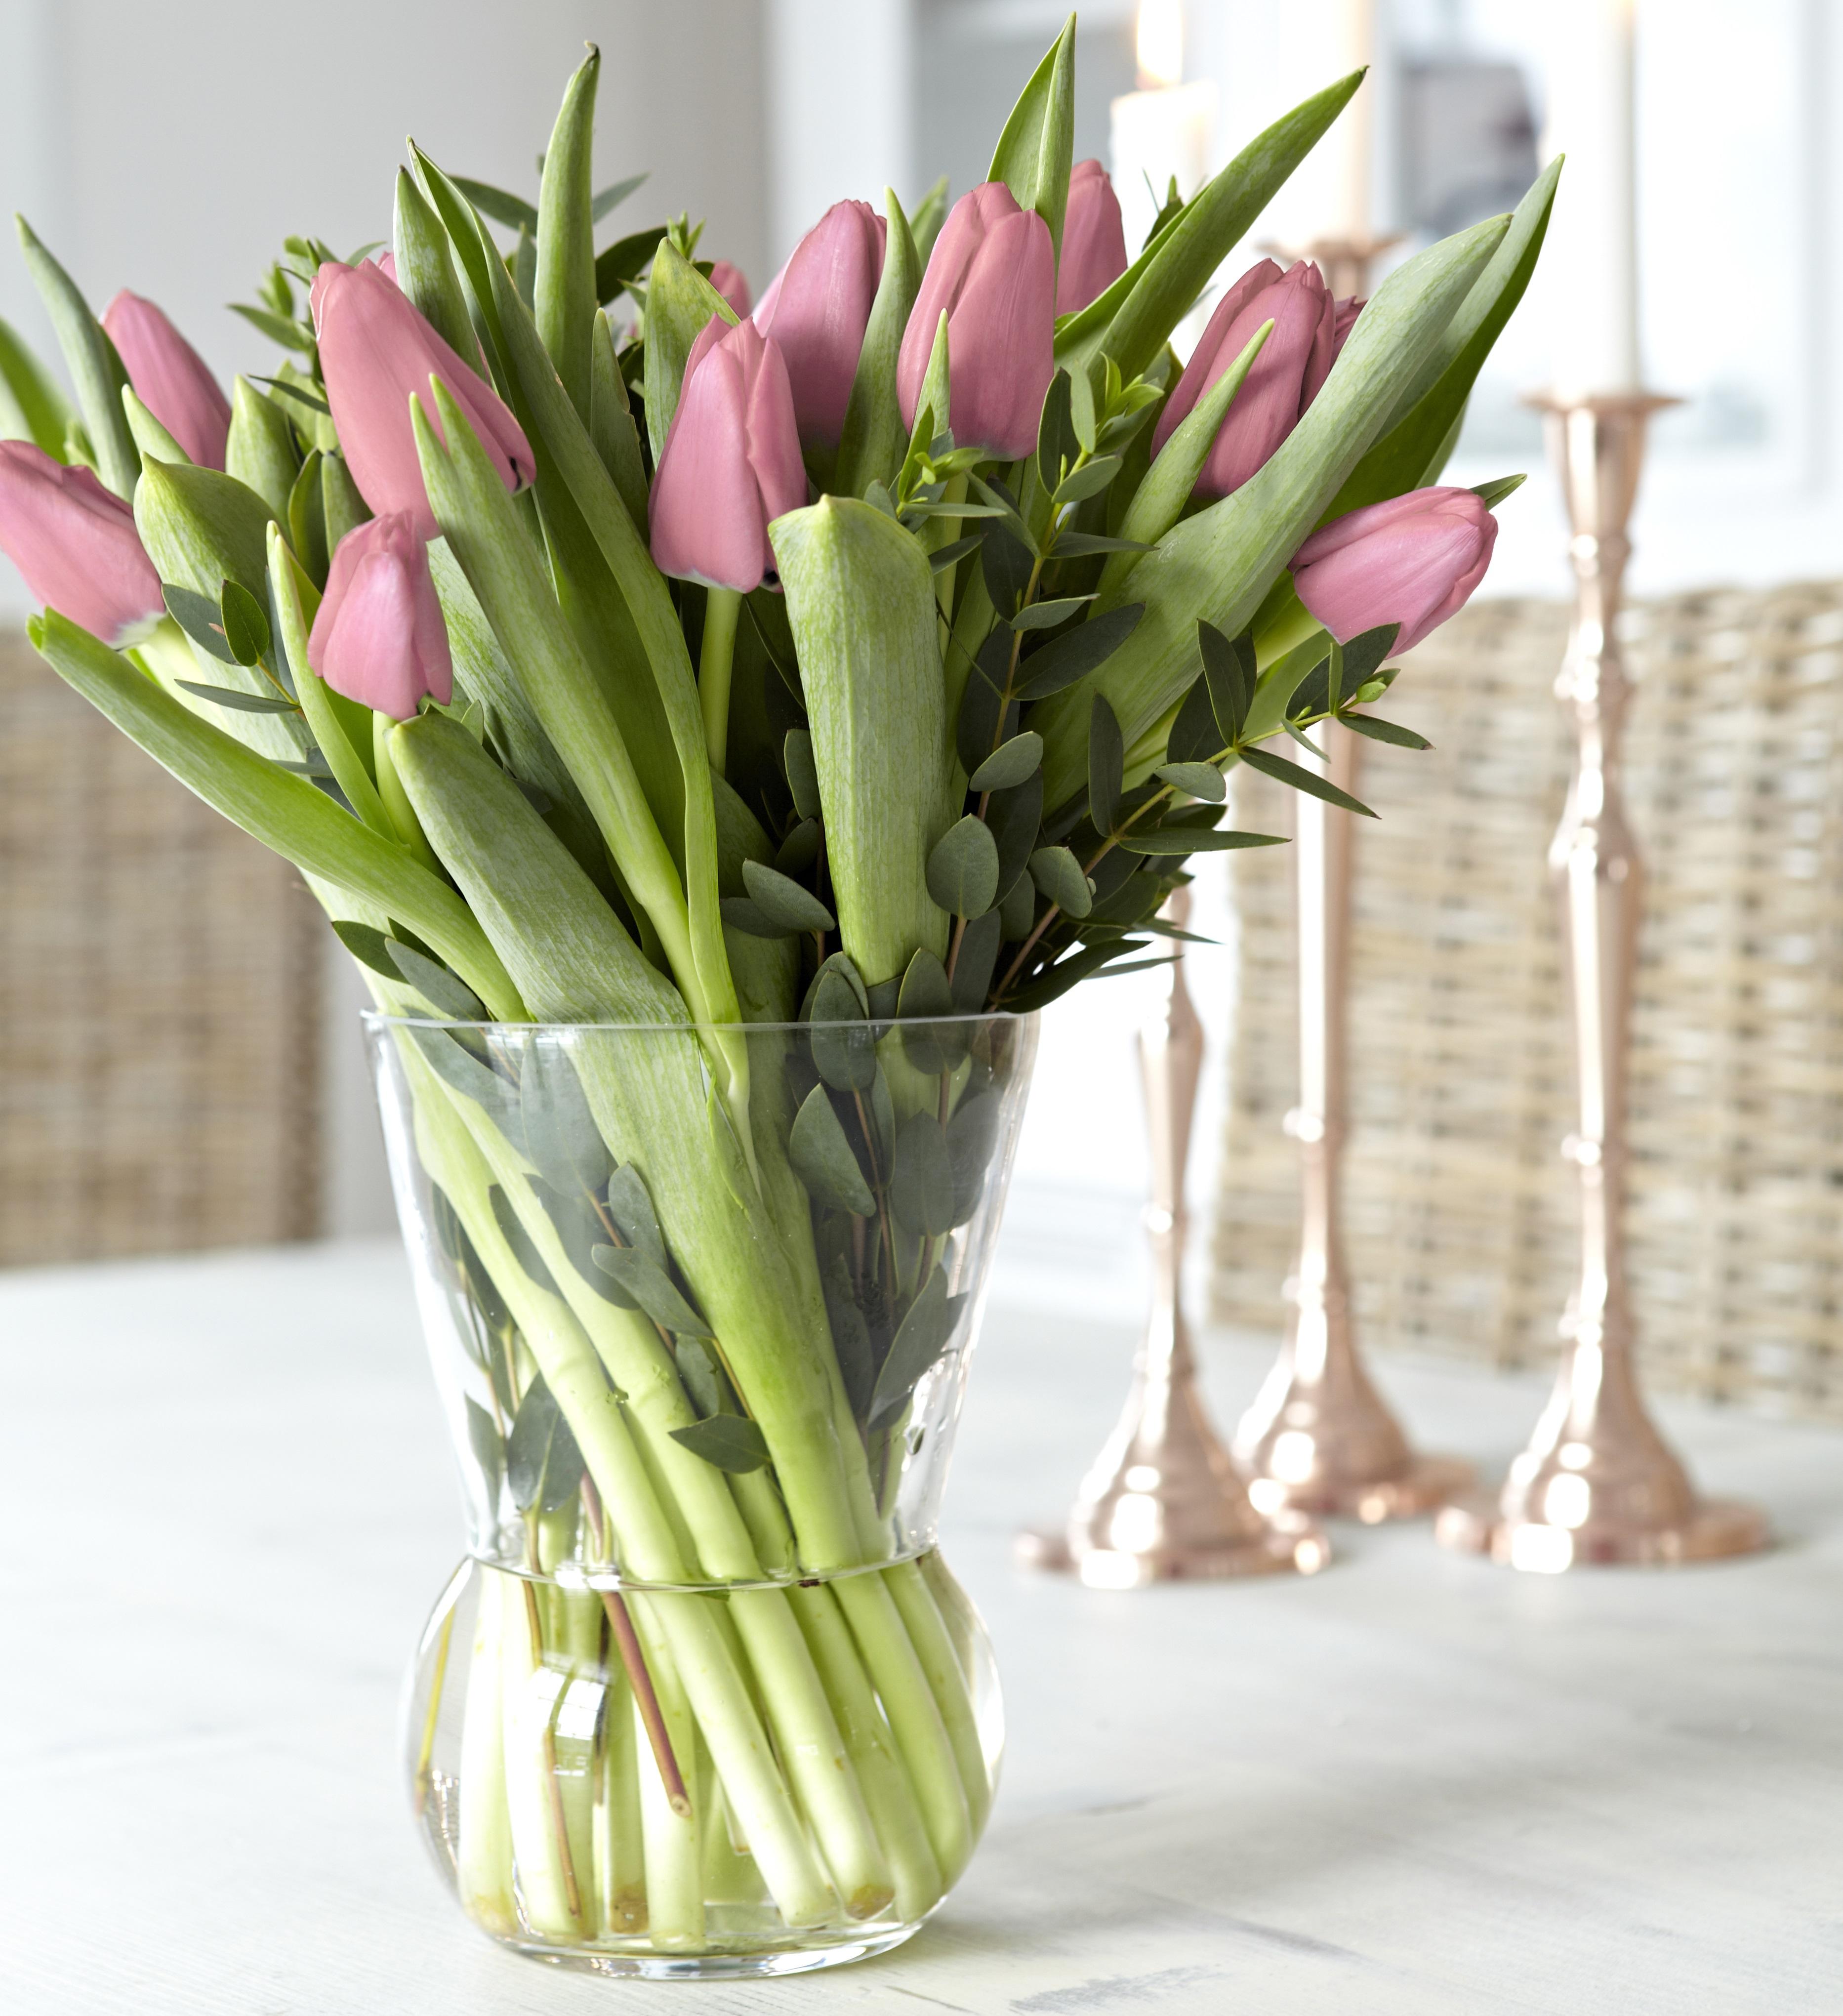 Vintage glass tulip vase